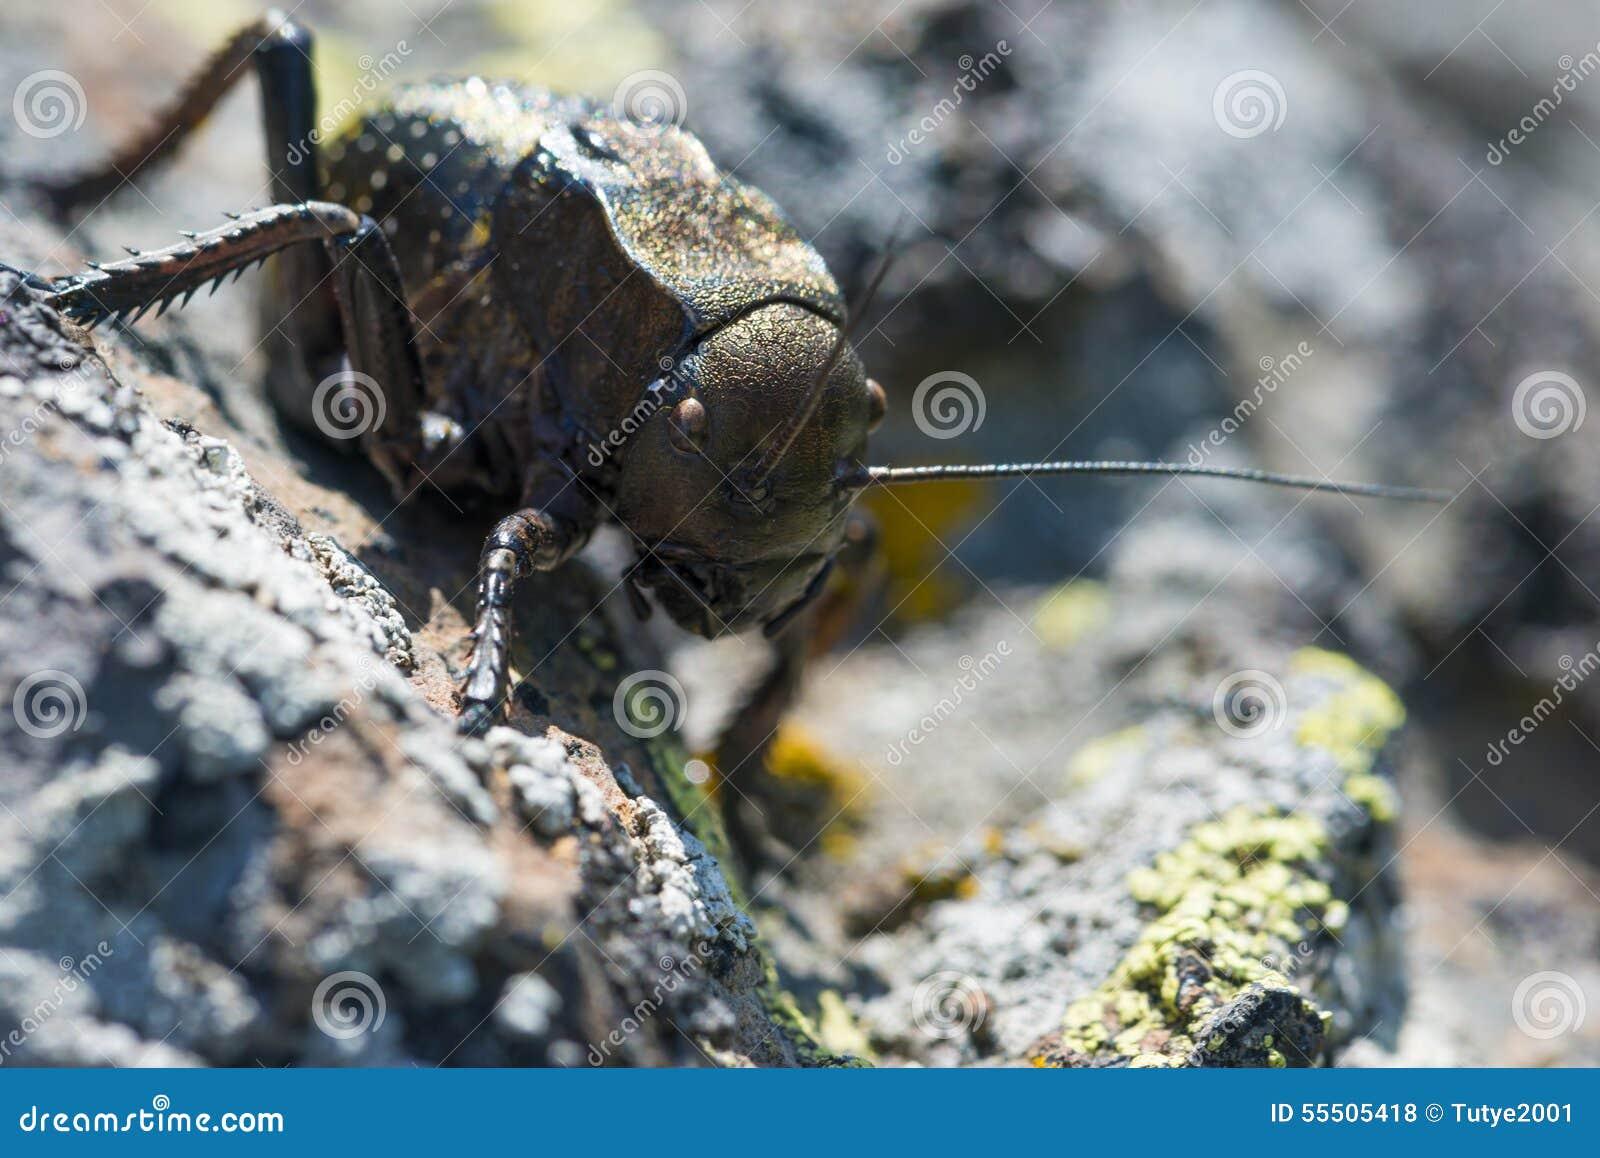 Bradyporus dasypus in natural background .